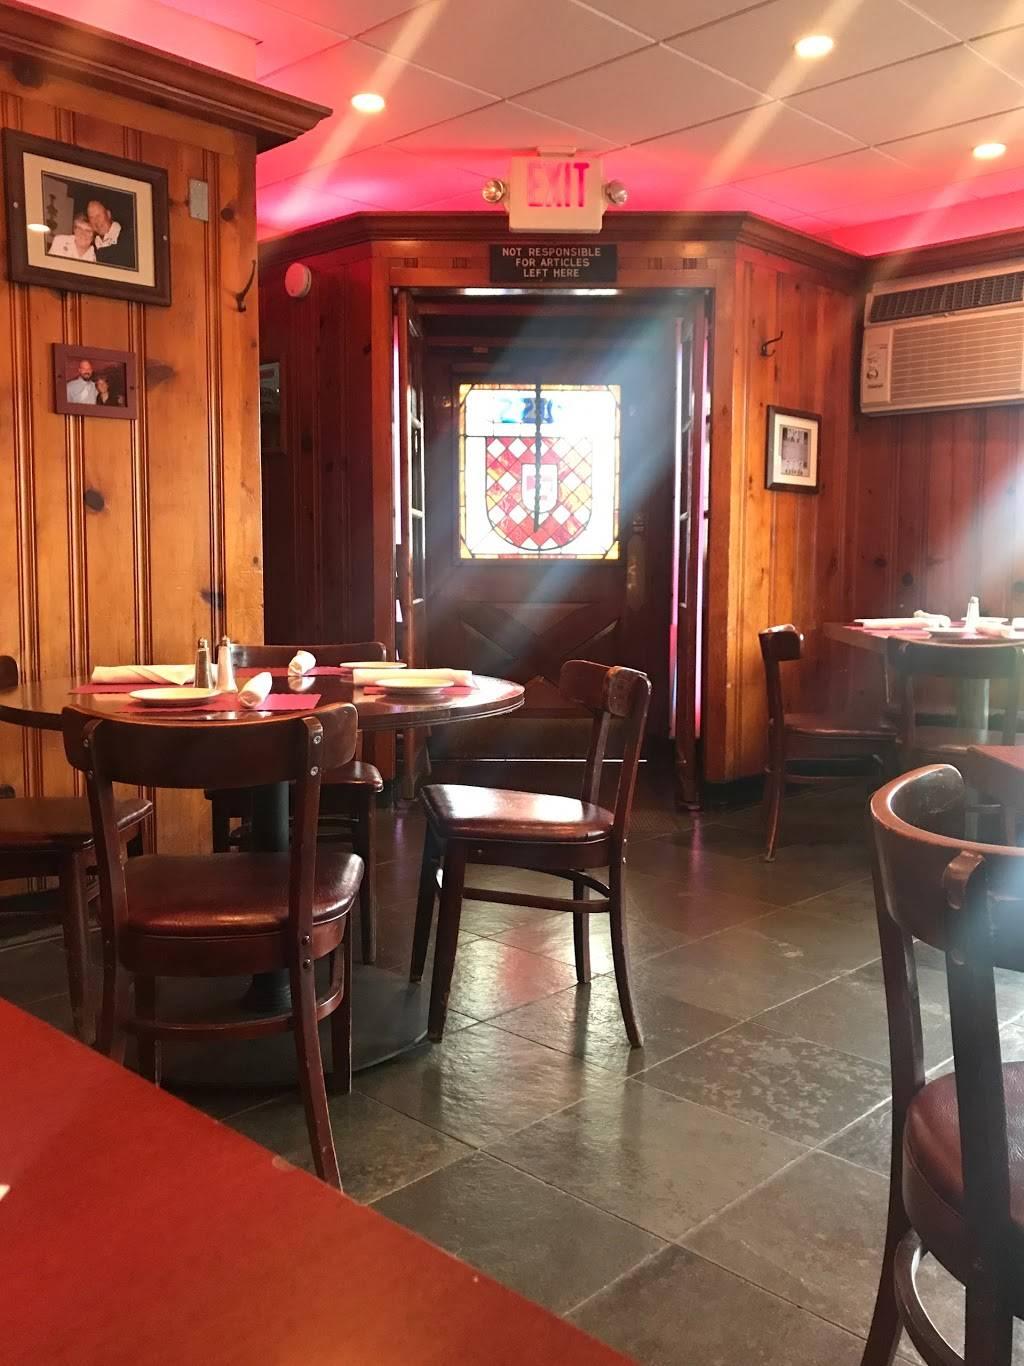 Guss   restaurant   10 Quassaick Ave, New Windsor, NY 12553, USA   8455613113 OR +1 845-561-3113